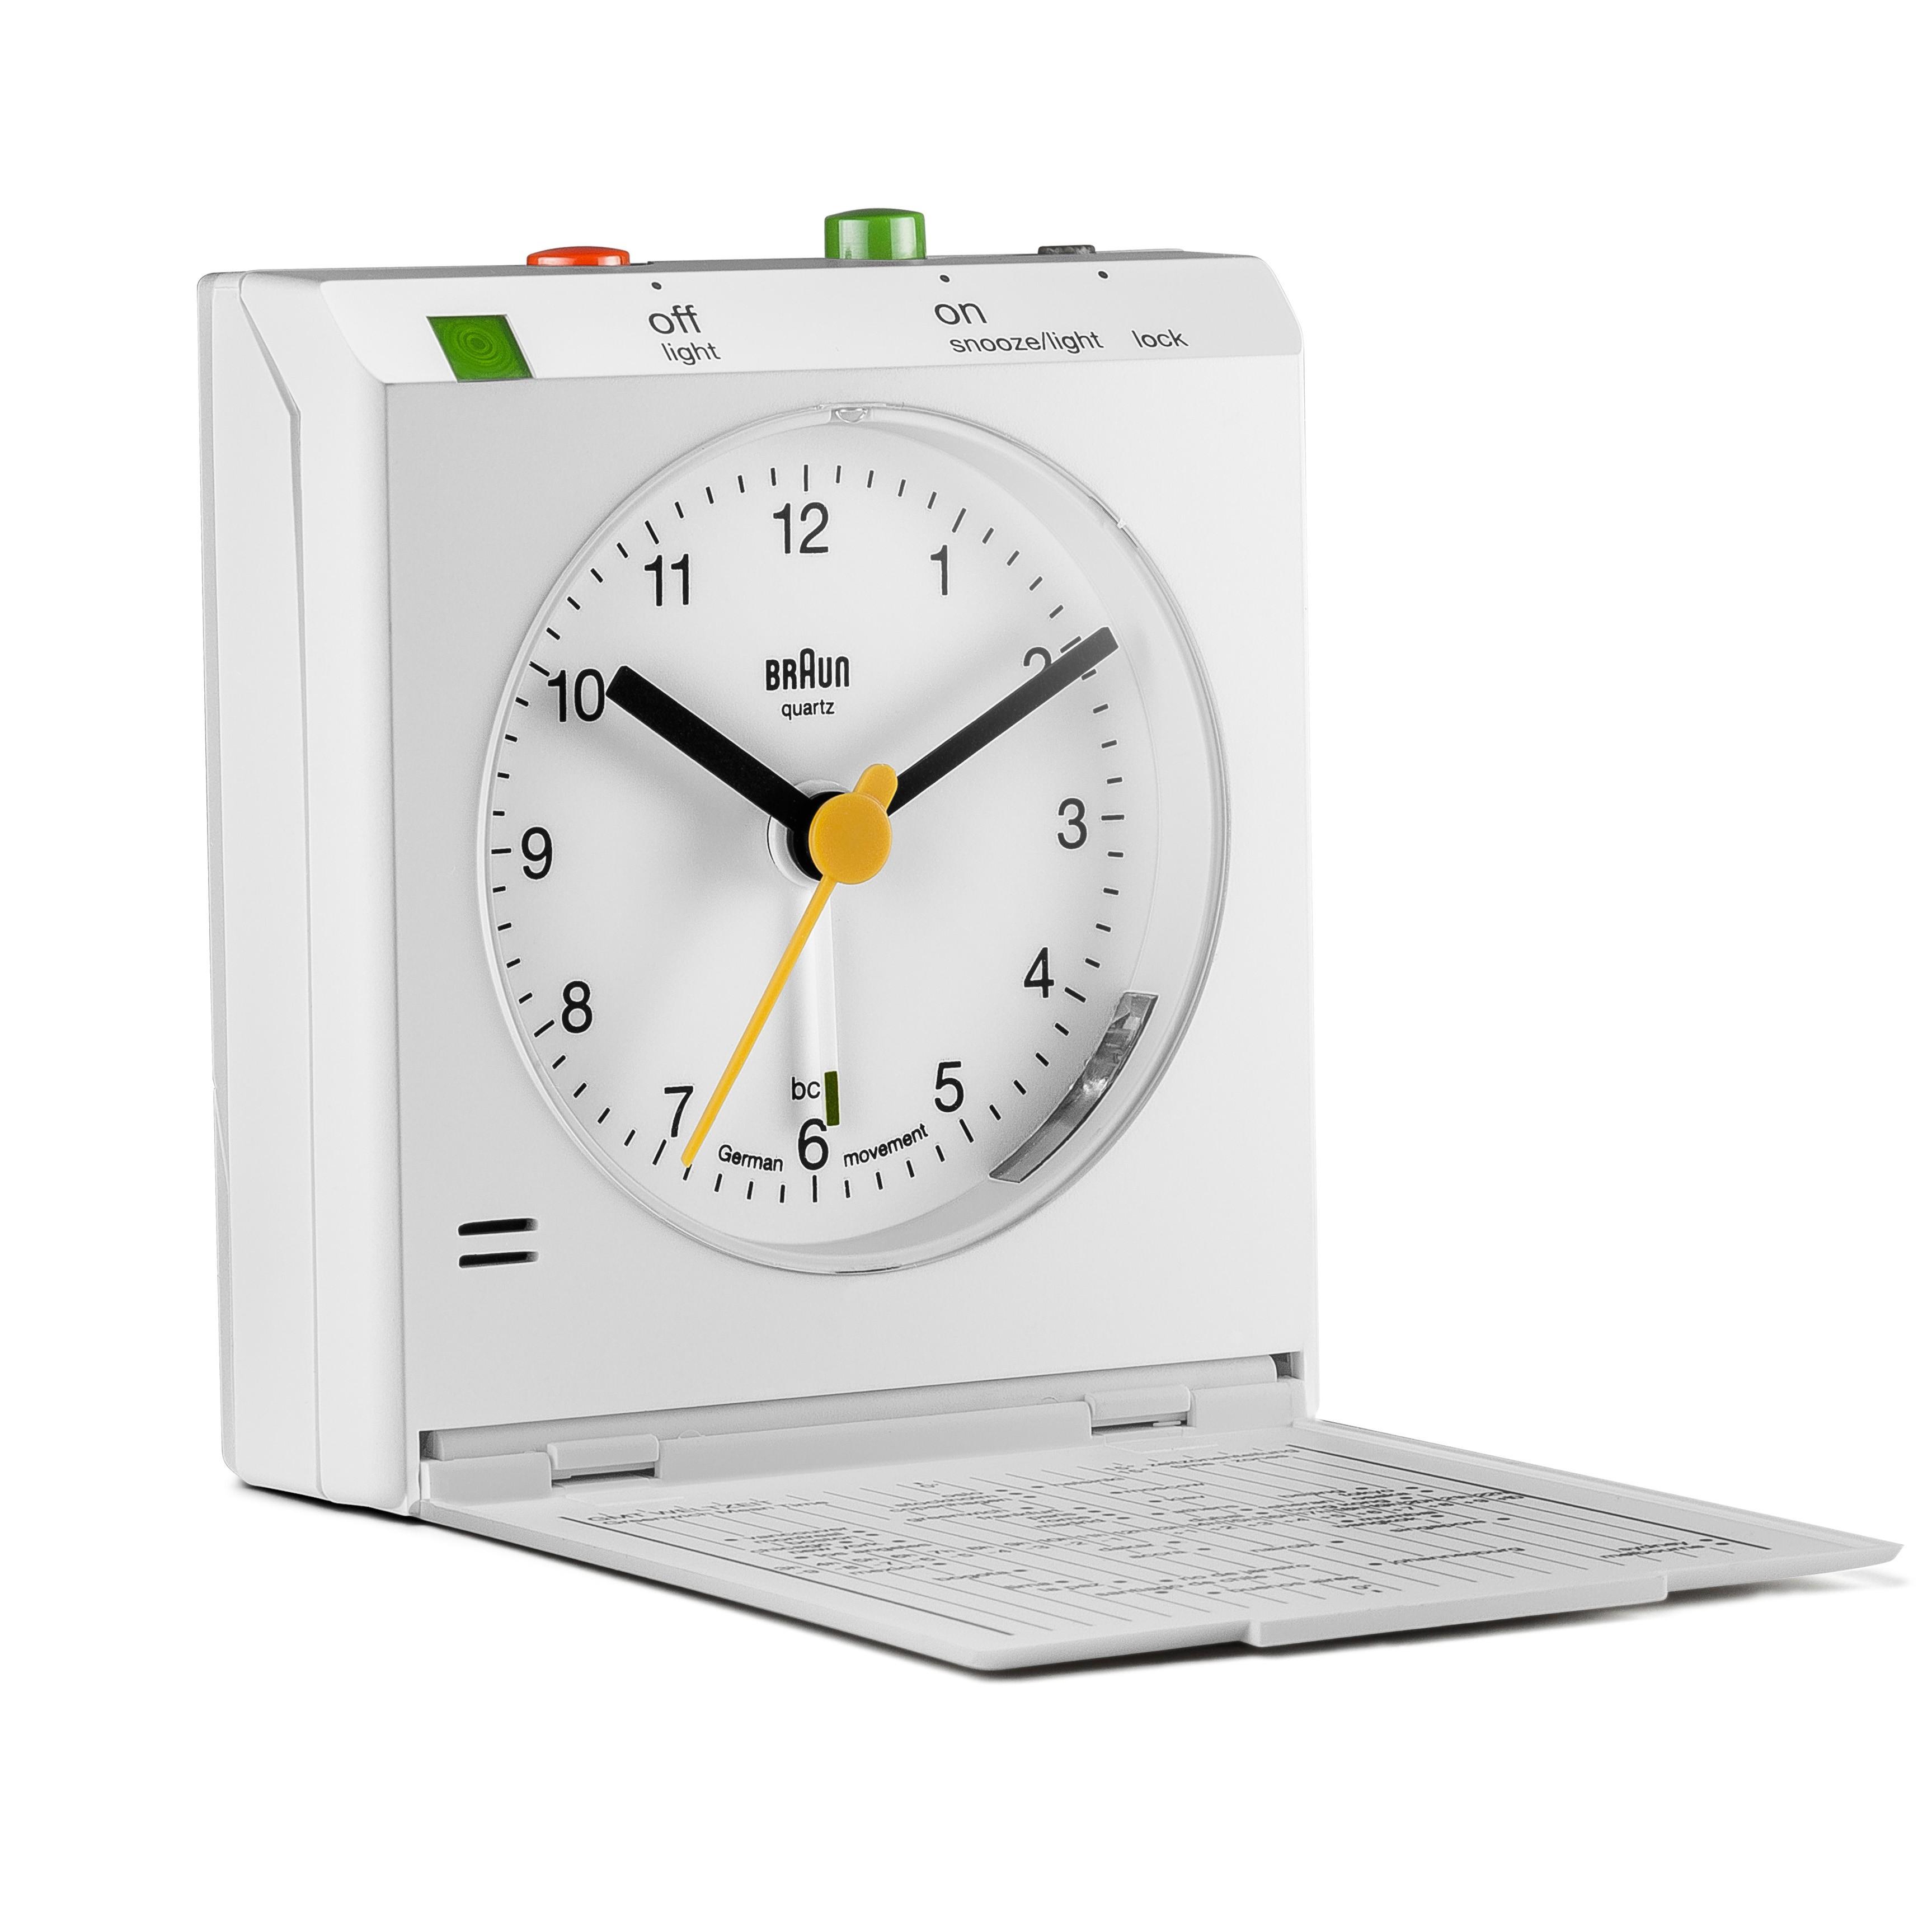 Braun BNC005 Classic Relflex Control Travel Alarm Clock - BNC005